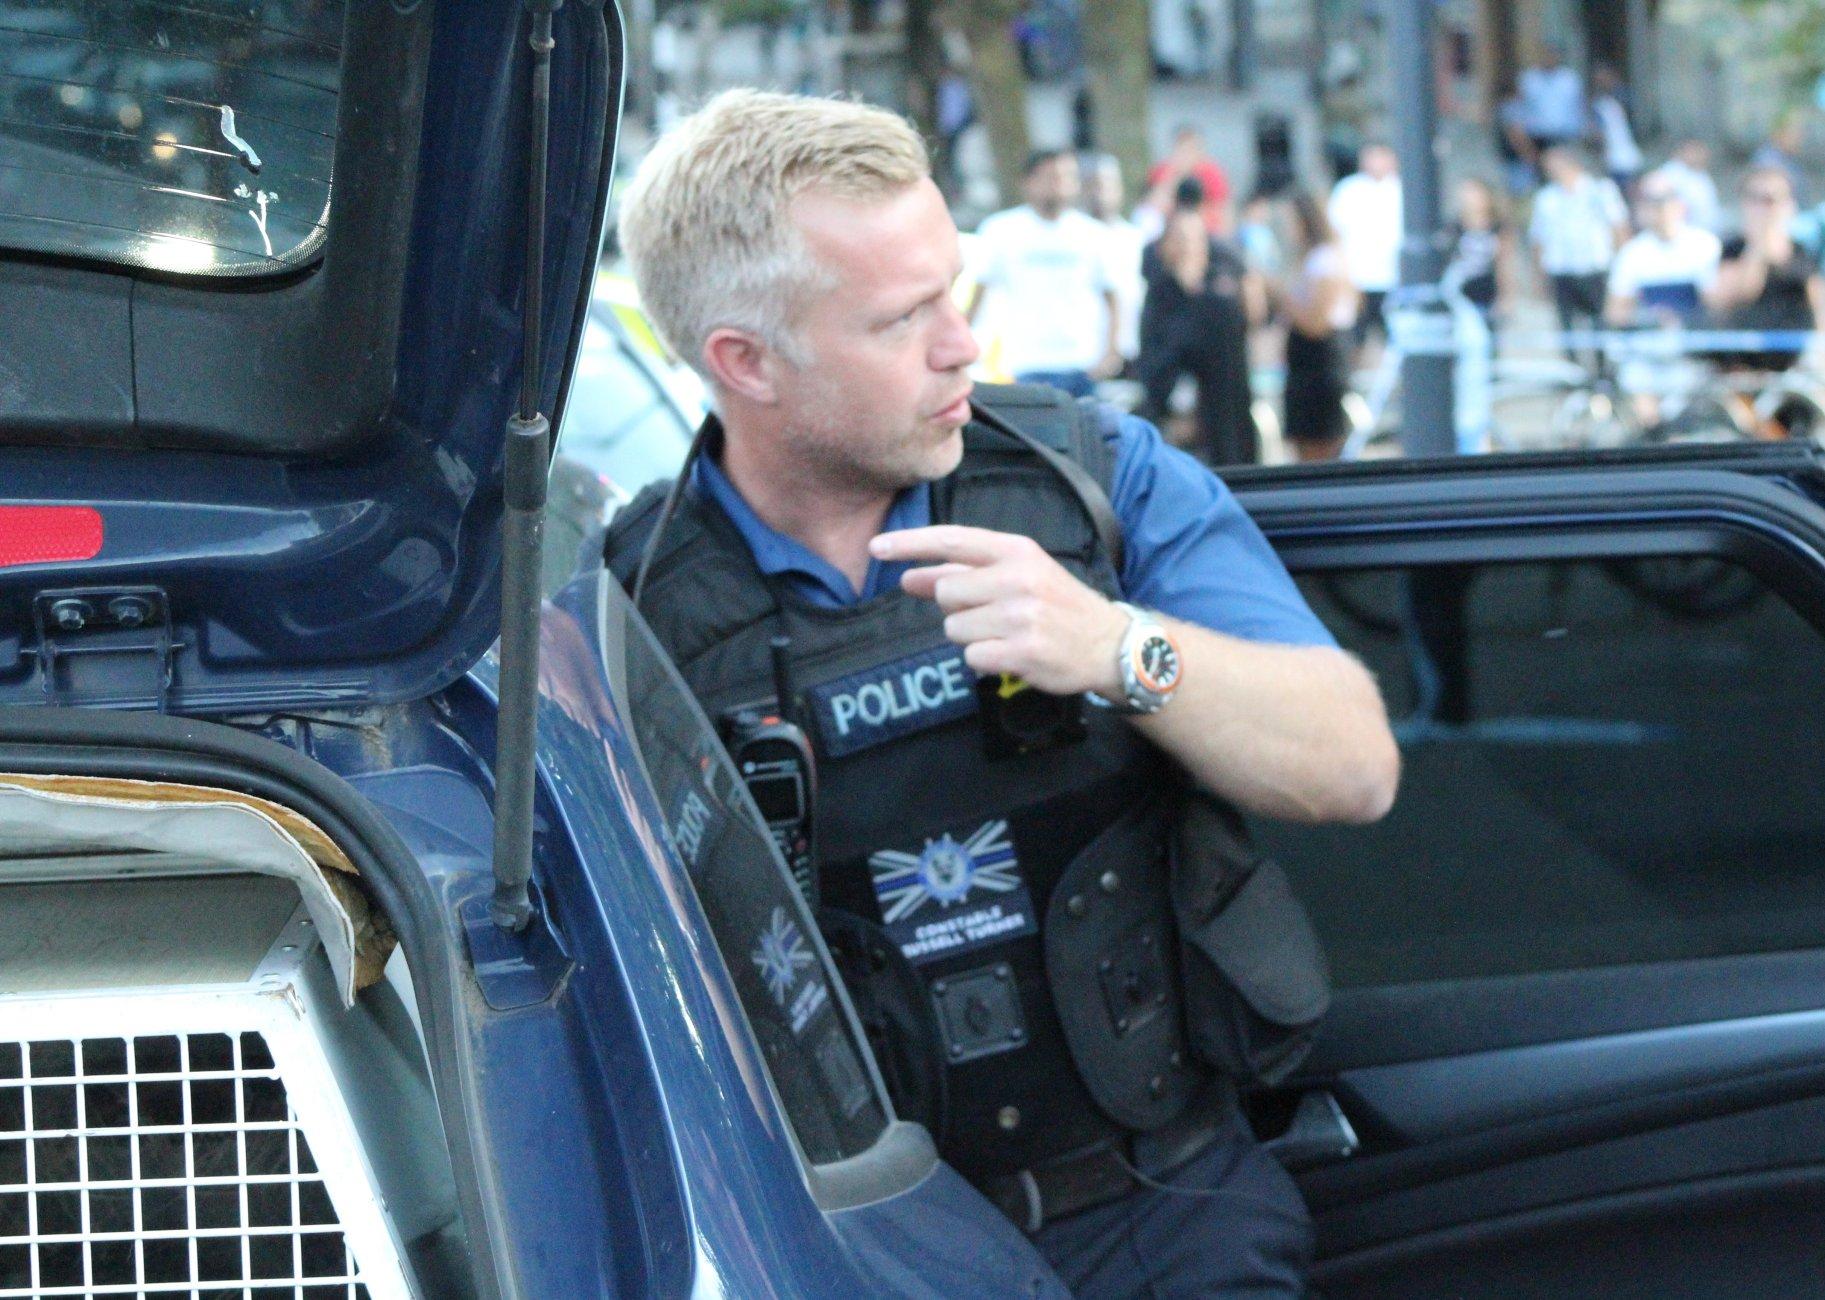 Police work (sometimes)